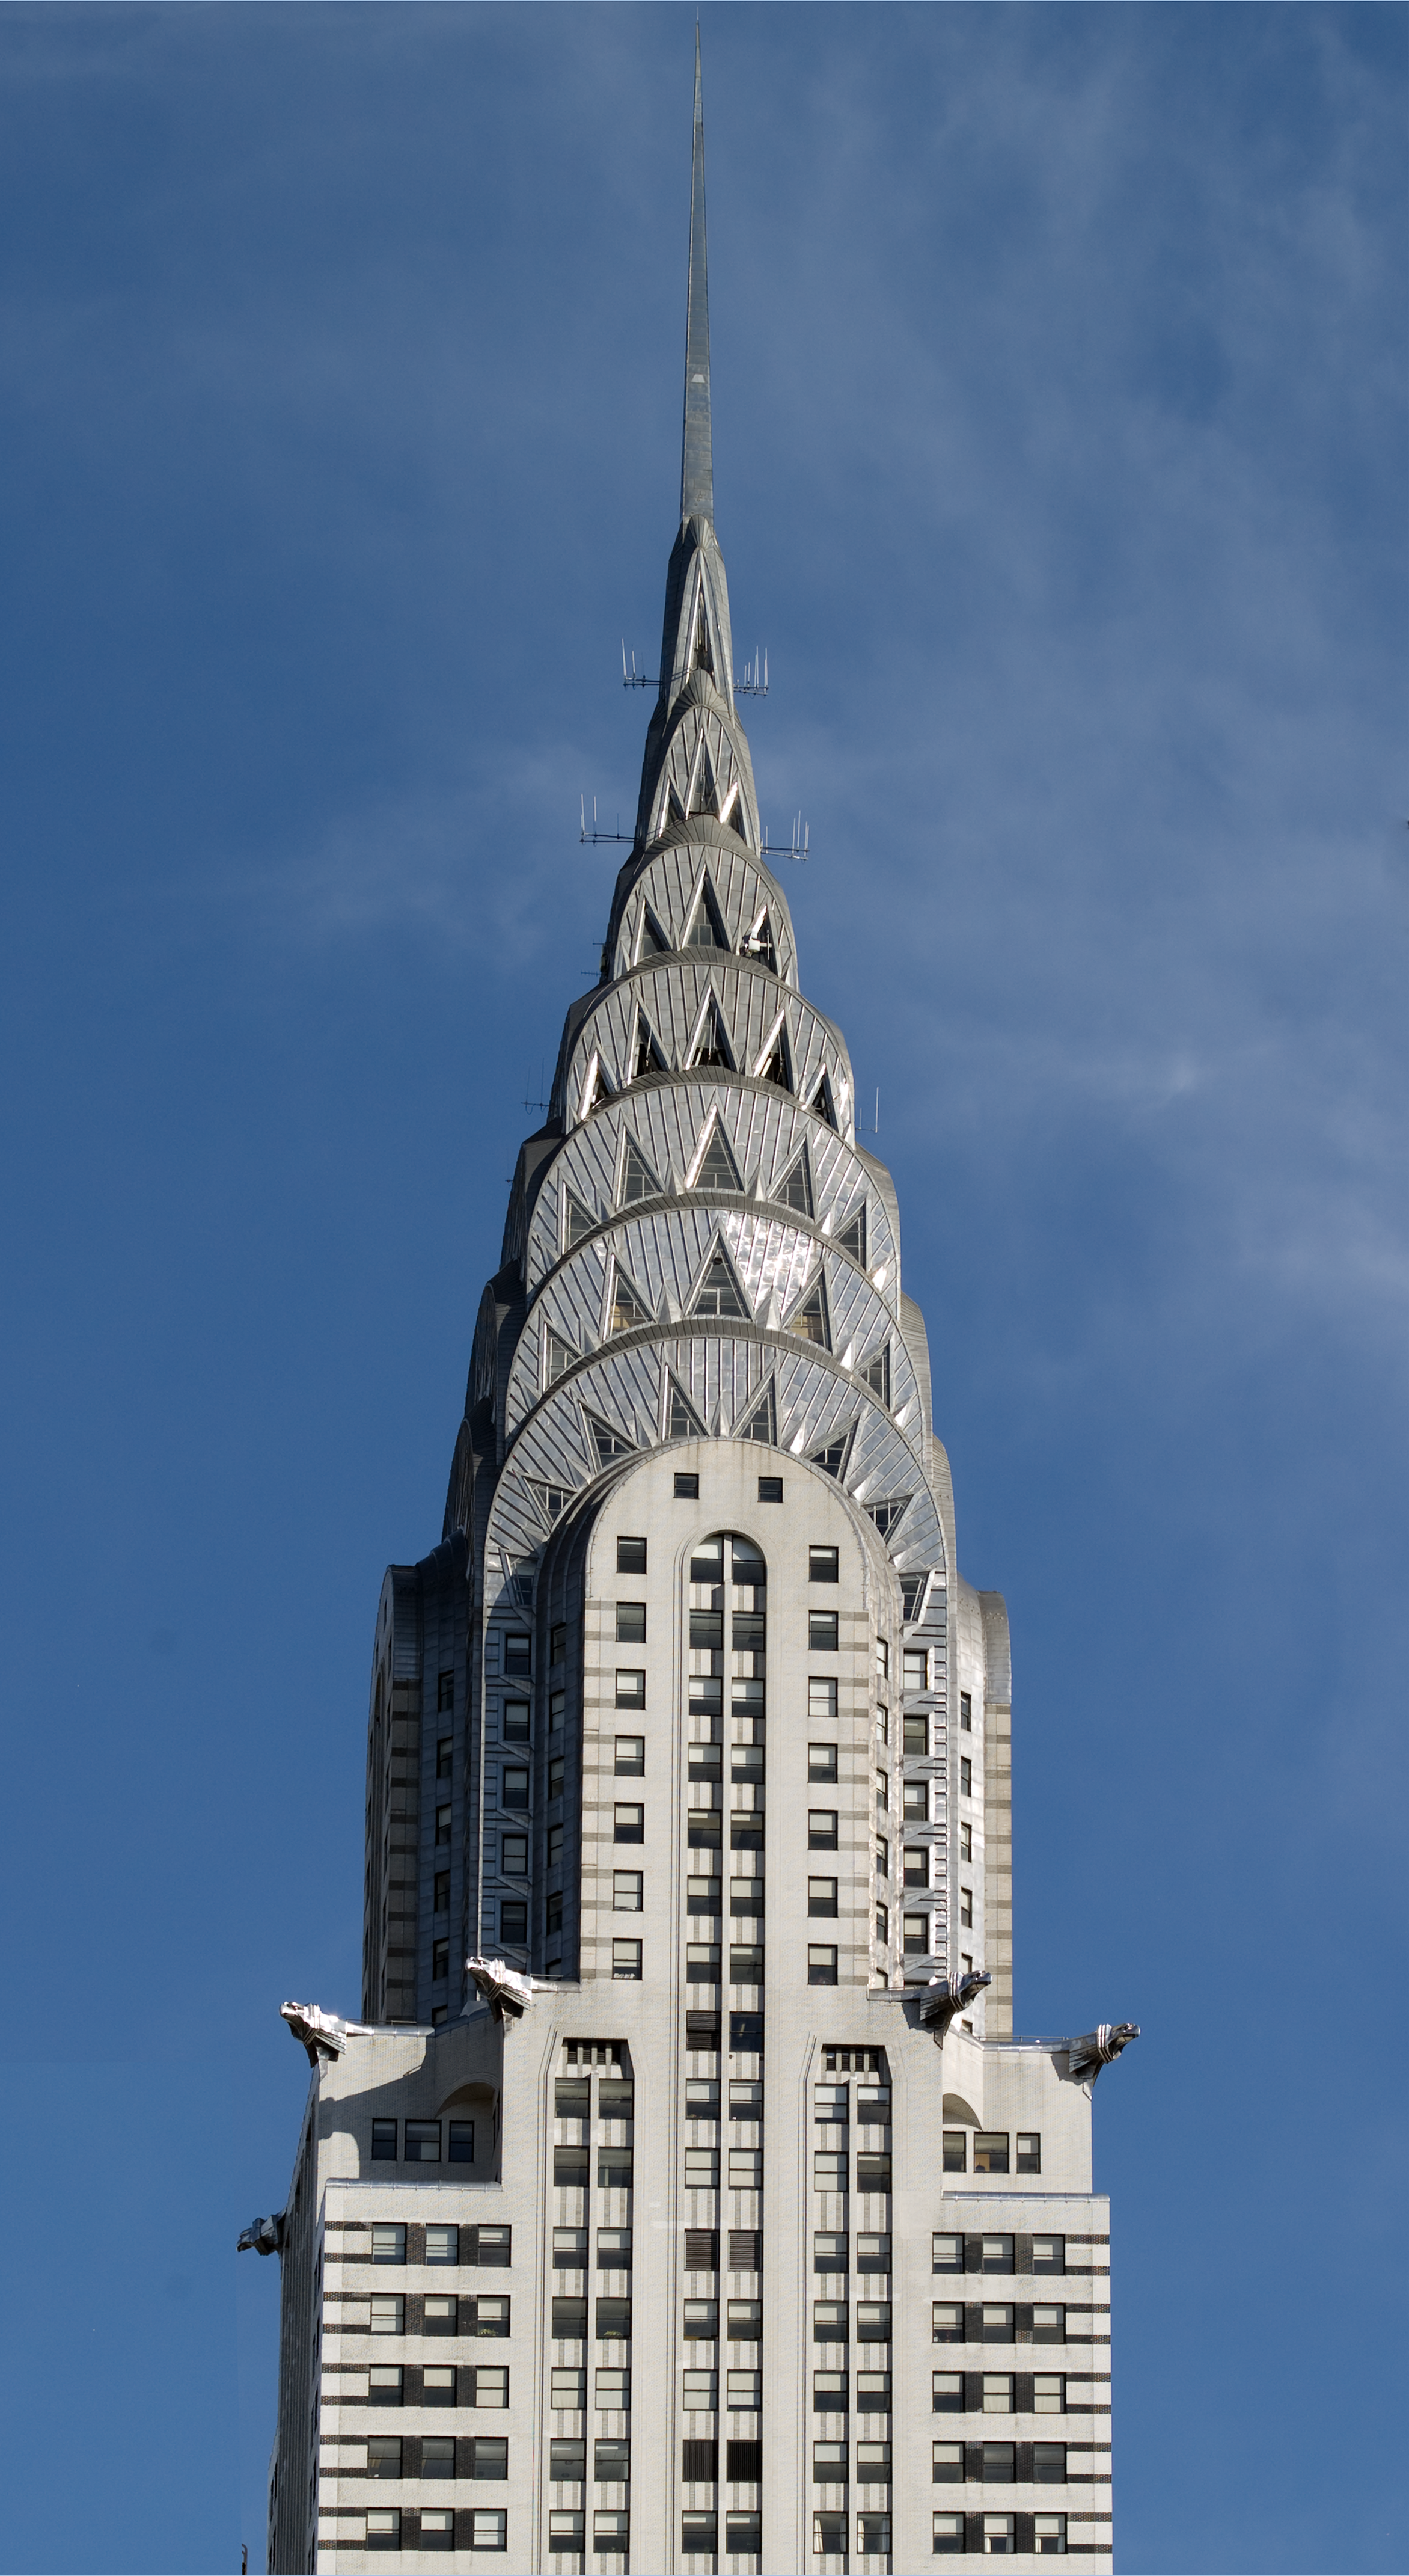 The Chrysler Building Spire in Manhattan - Art Deco